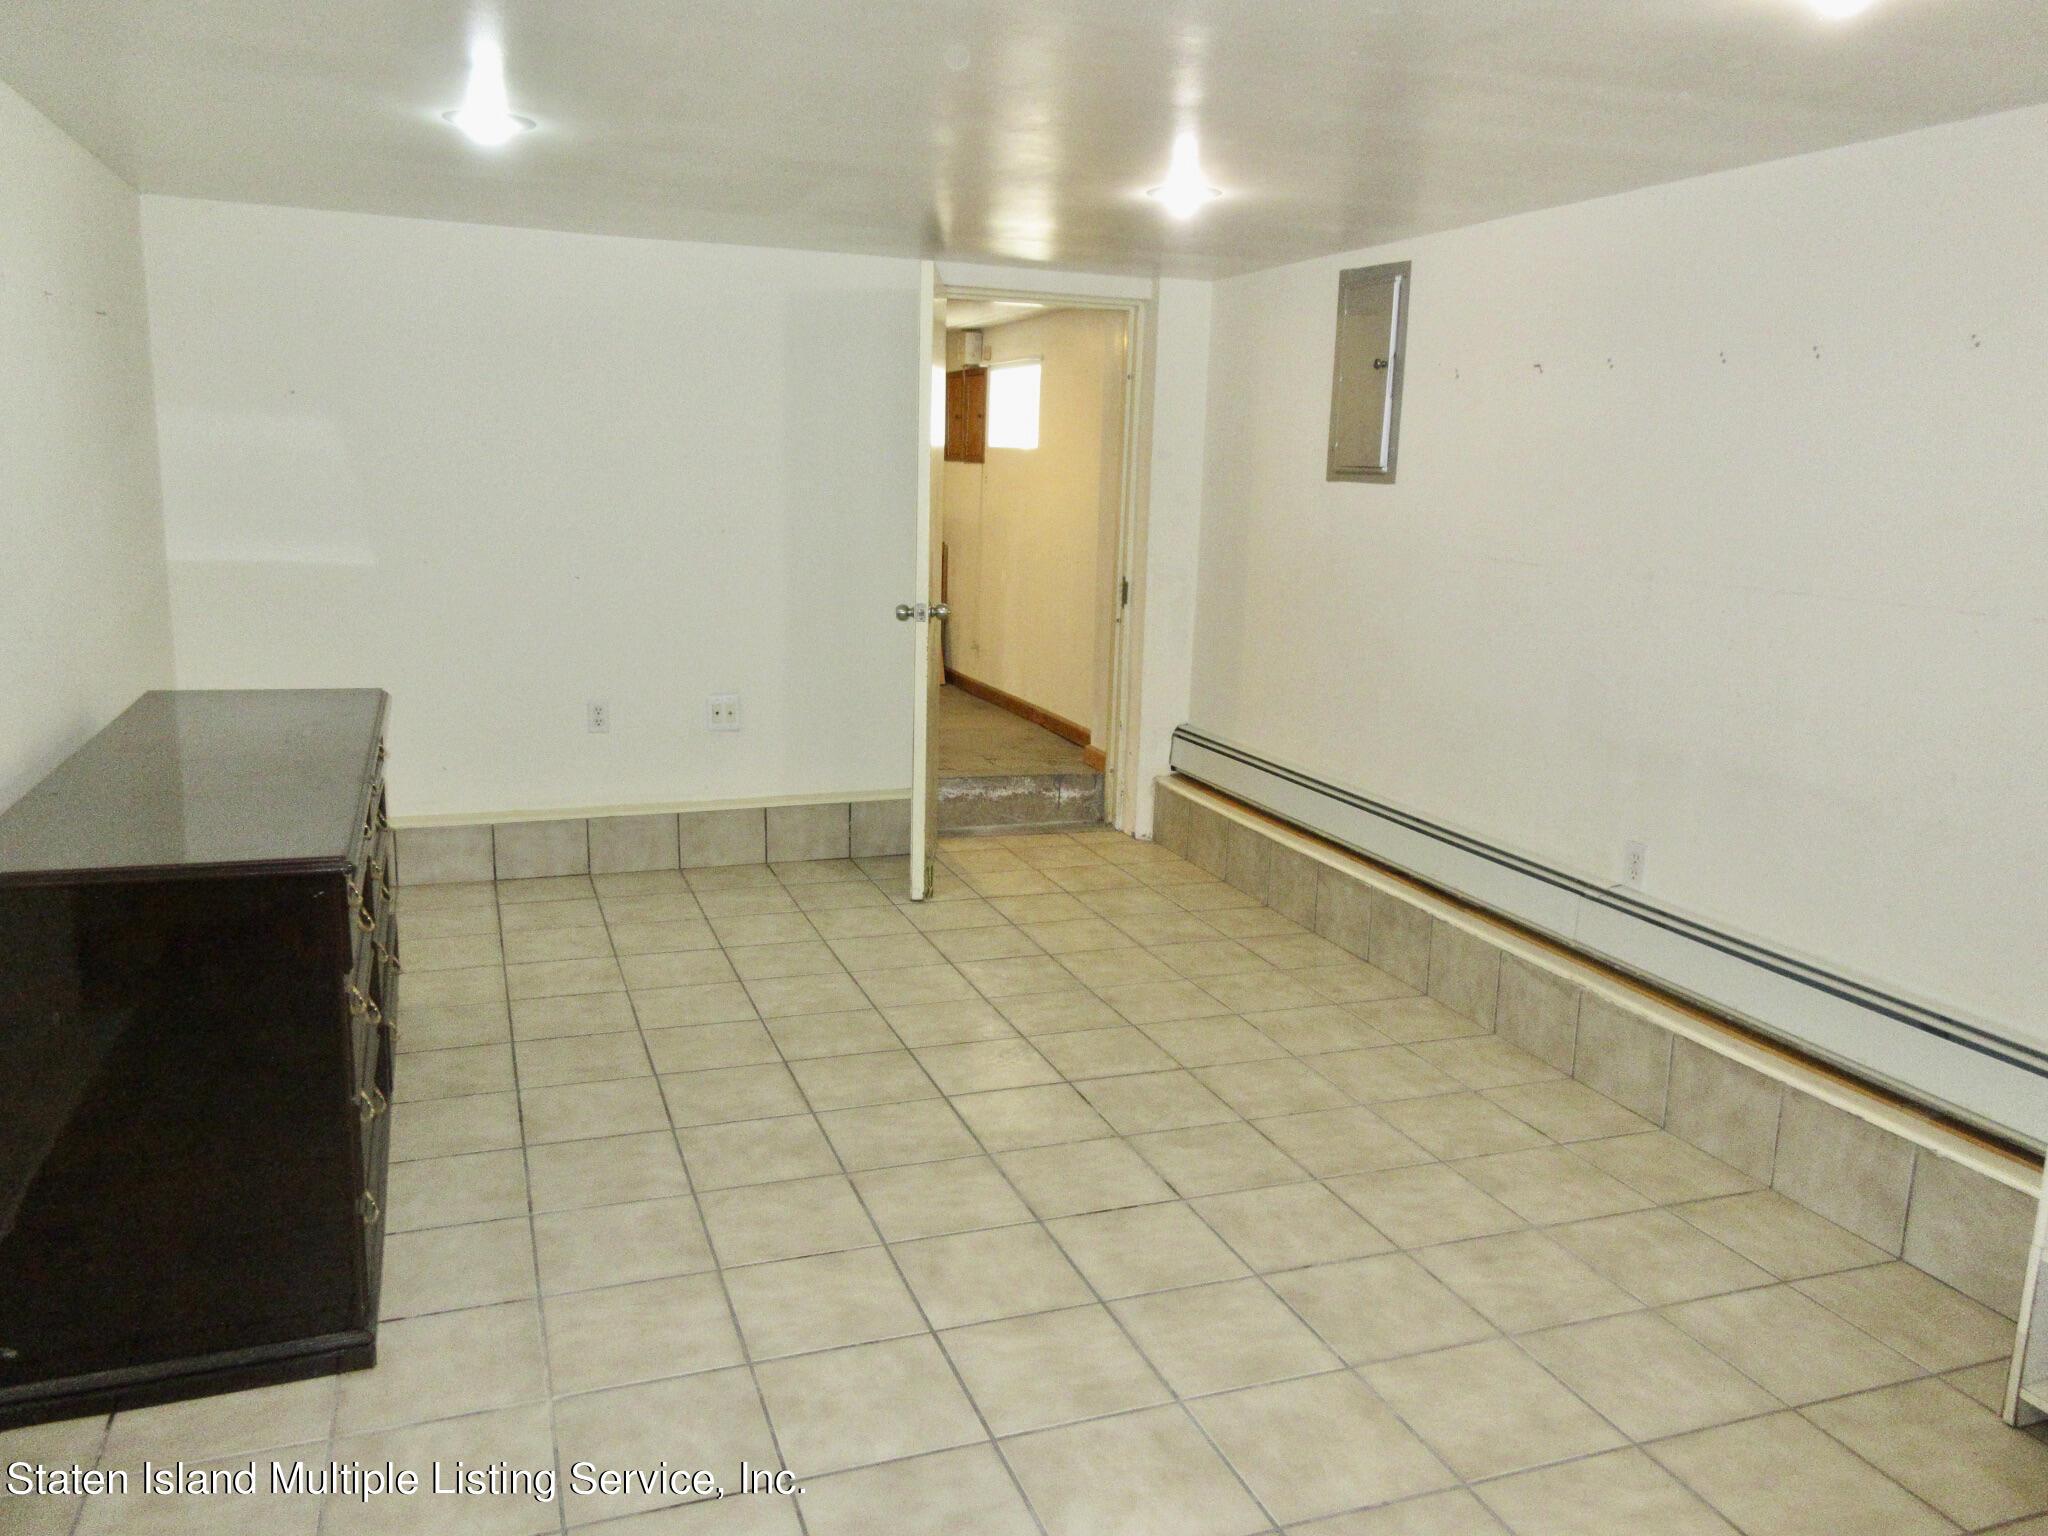 Two Family - Detached 89-91 David Street  Staten Island, NY 10308, MLS-1146516-29